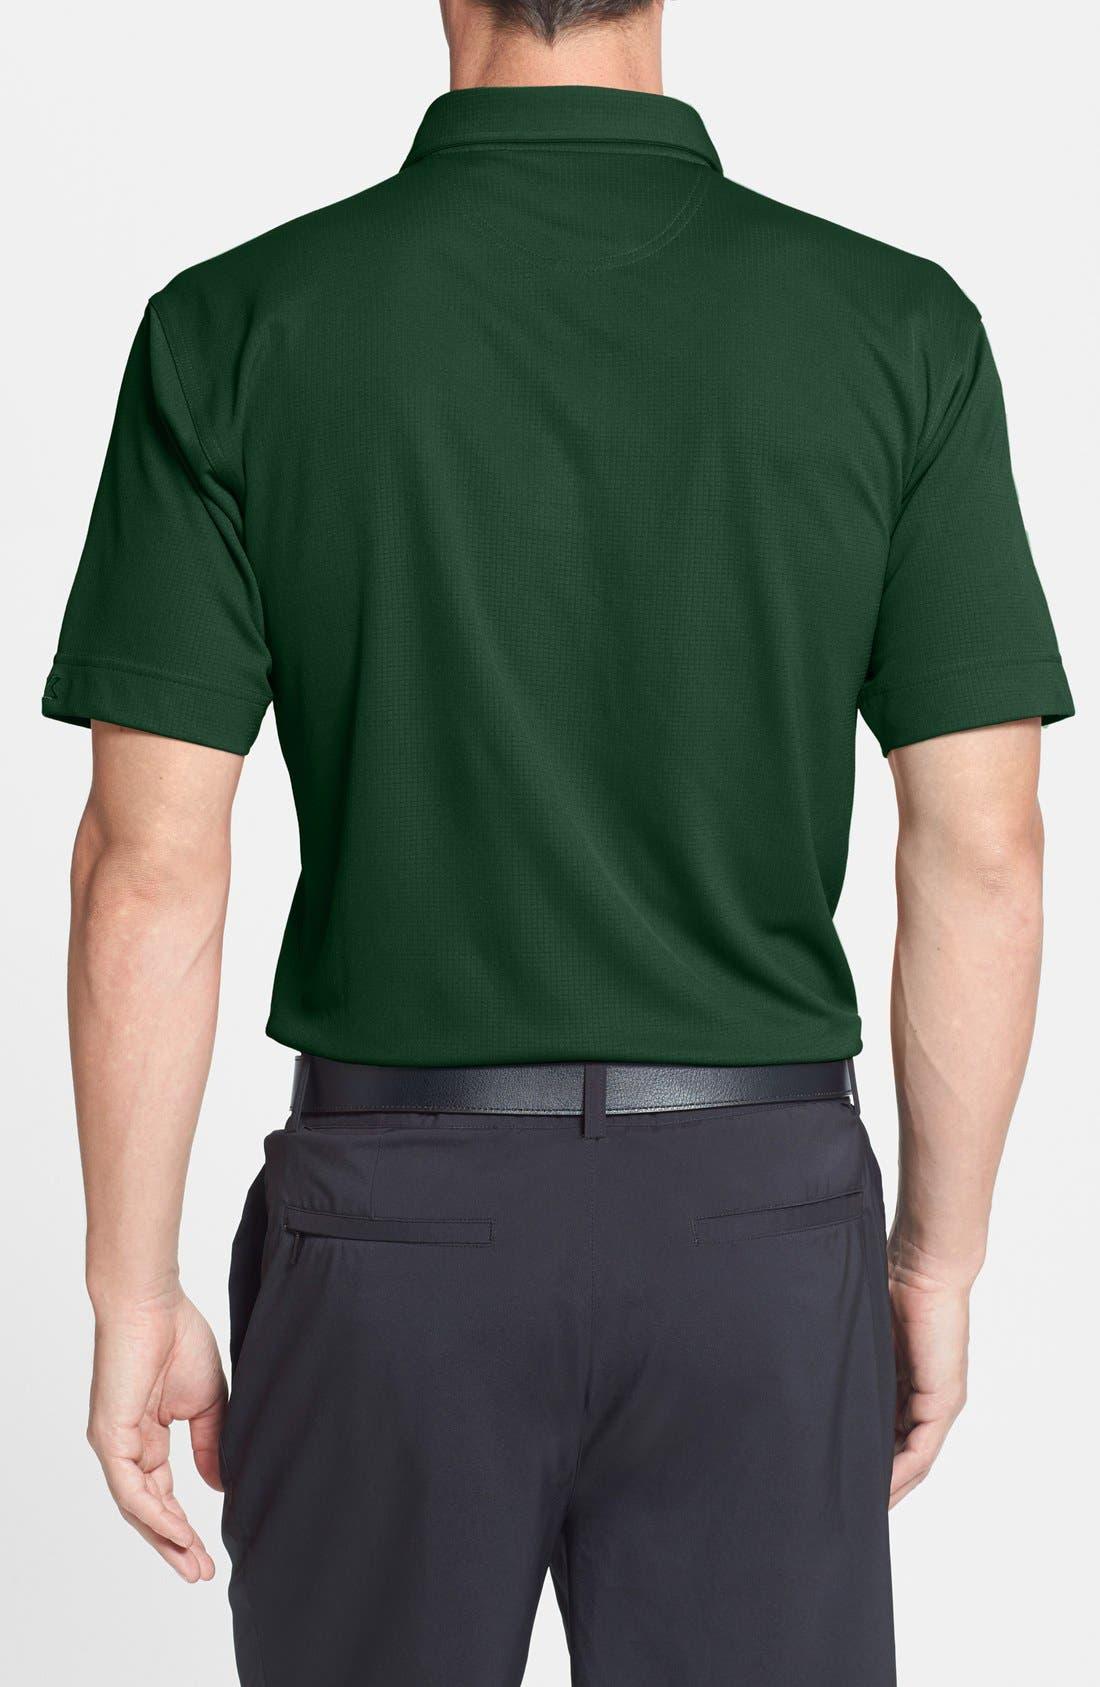 Green Bay Packers - Genre DryTec Moisture Wicking Polo,                             Alternate thumbnail 2, color,                             377